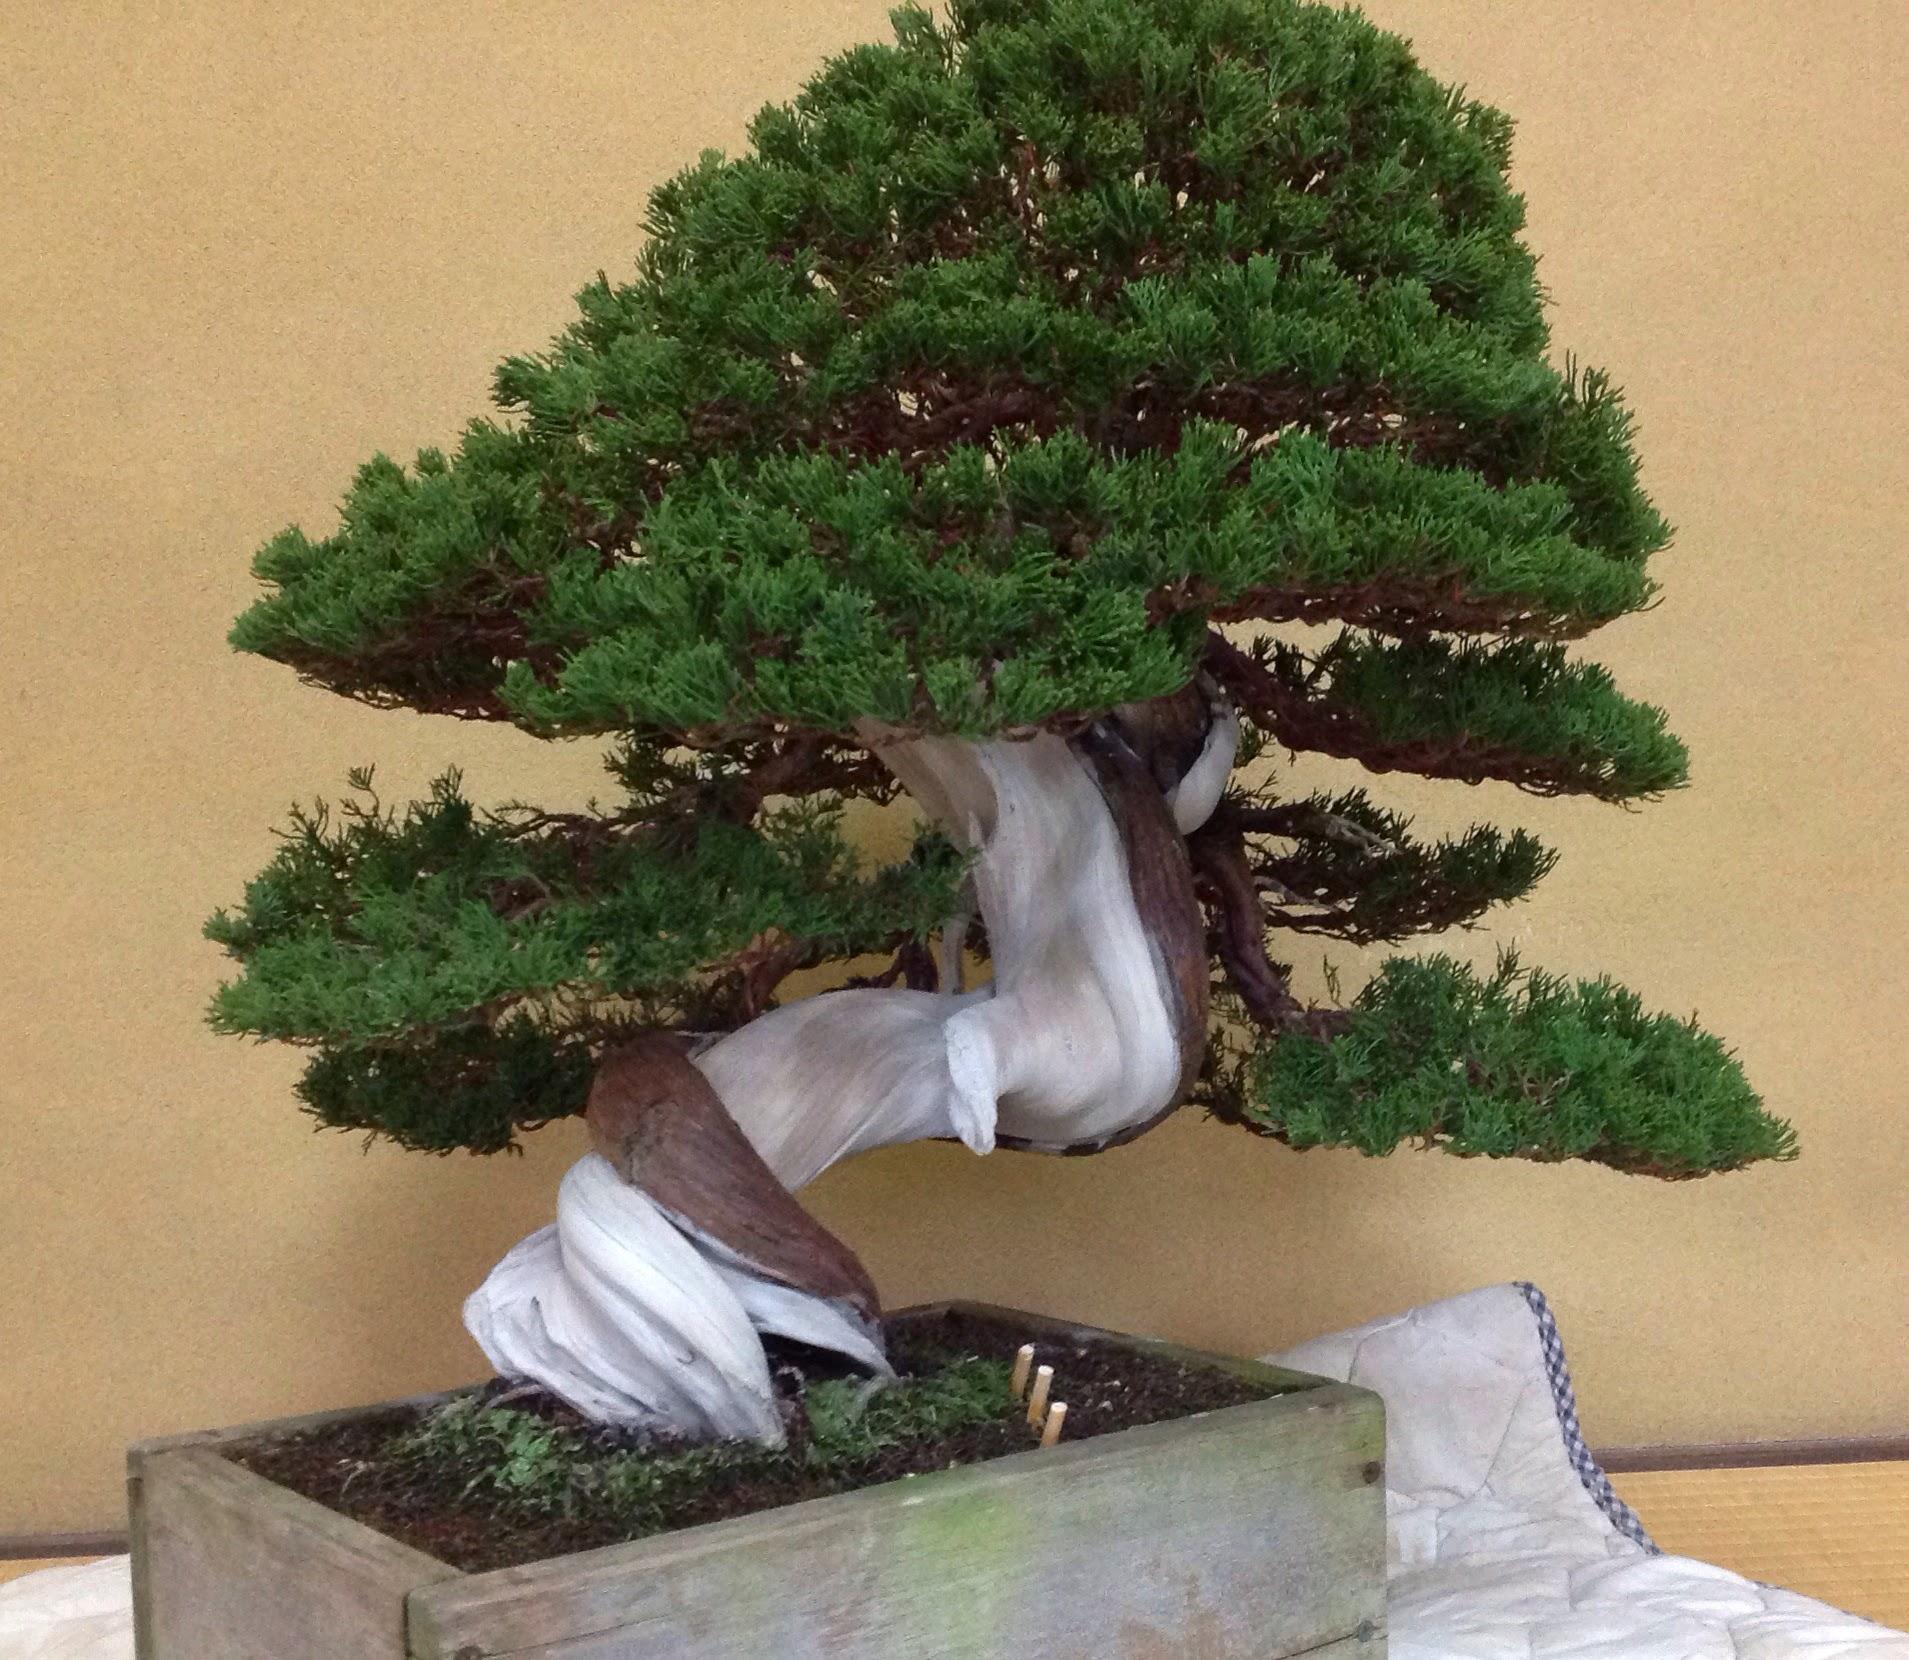 Saruyama Blog April 2014